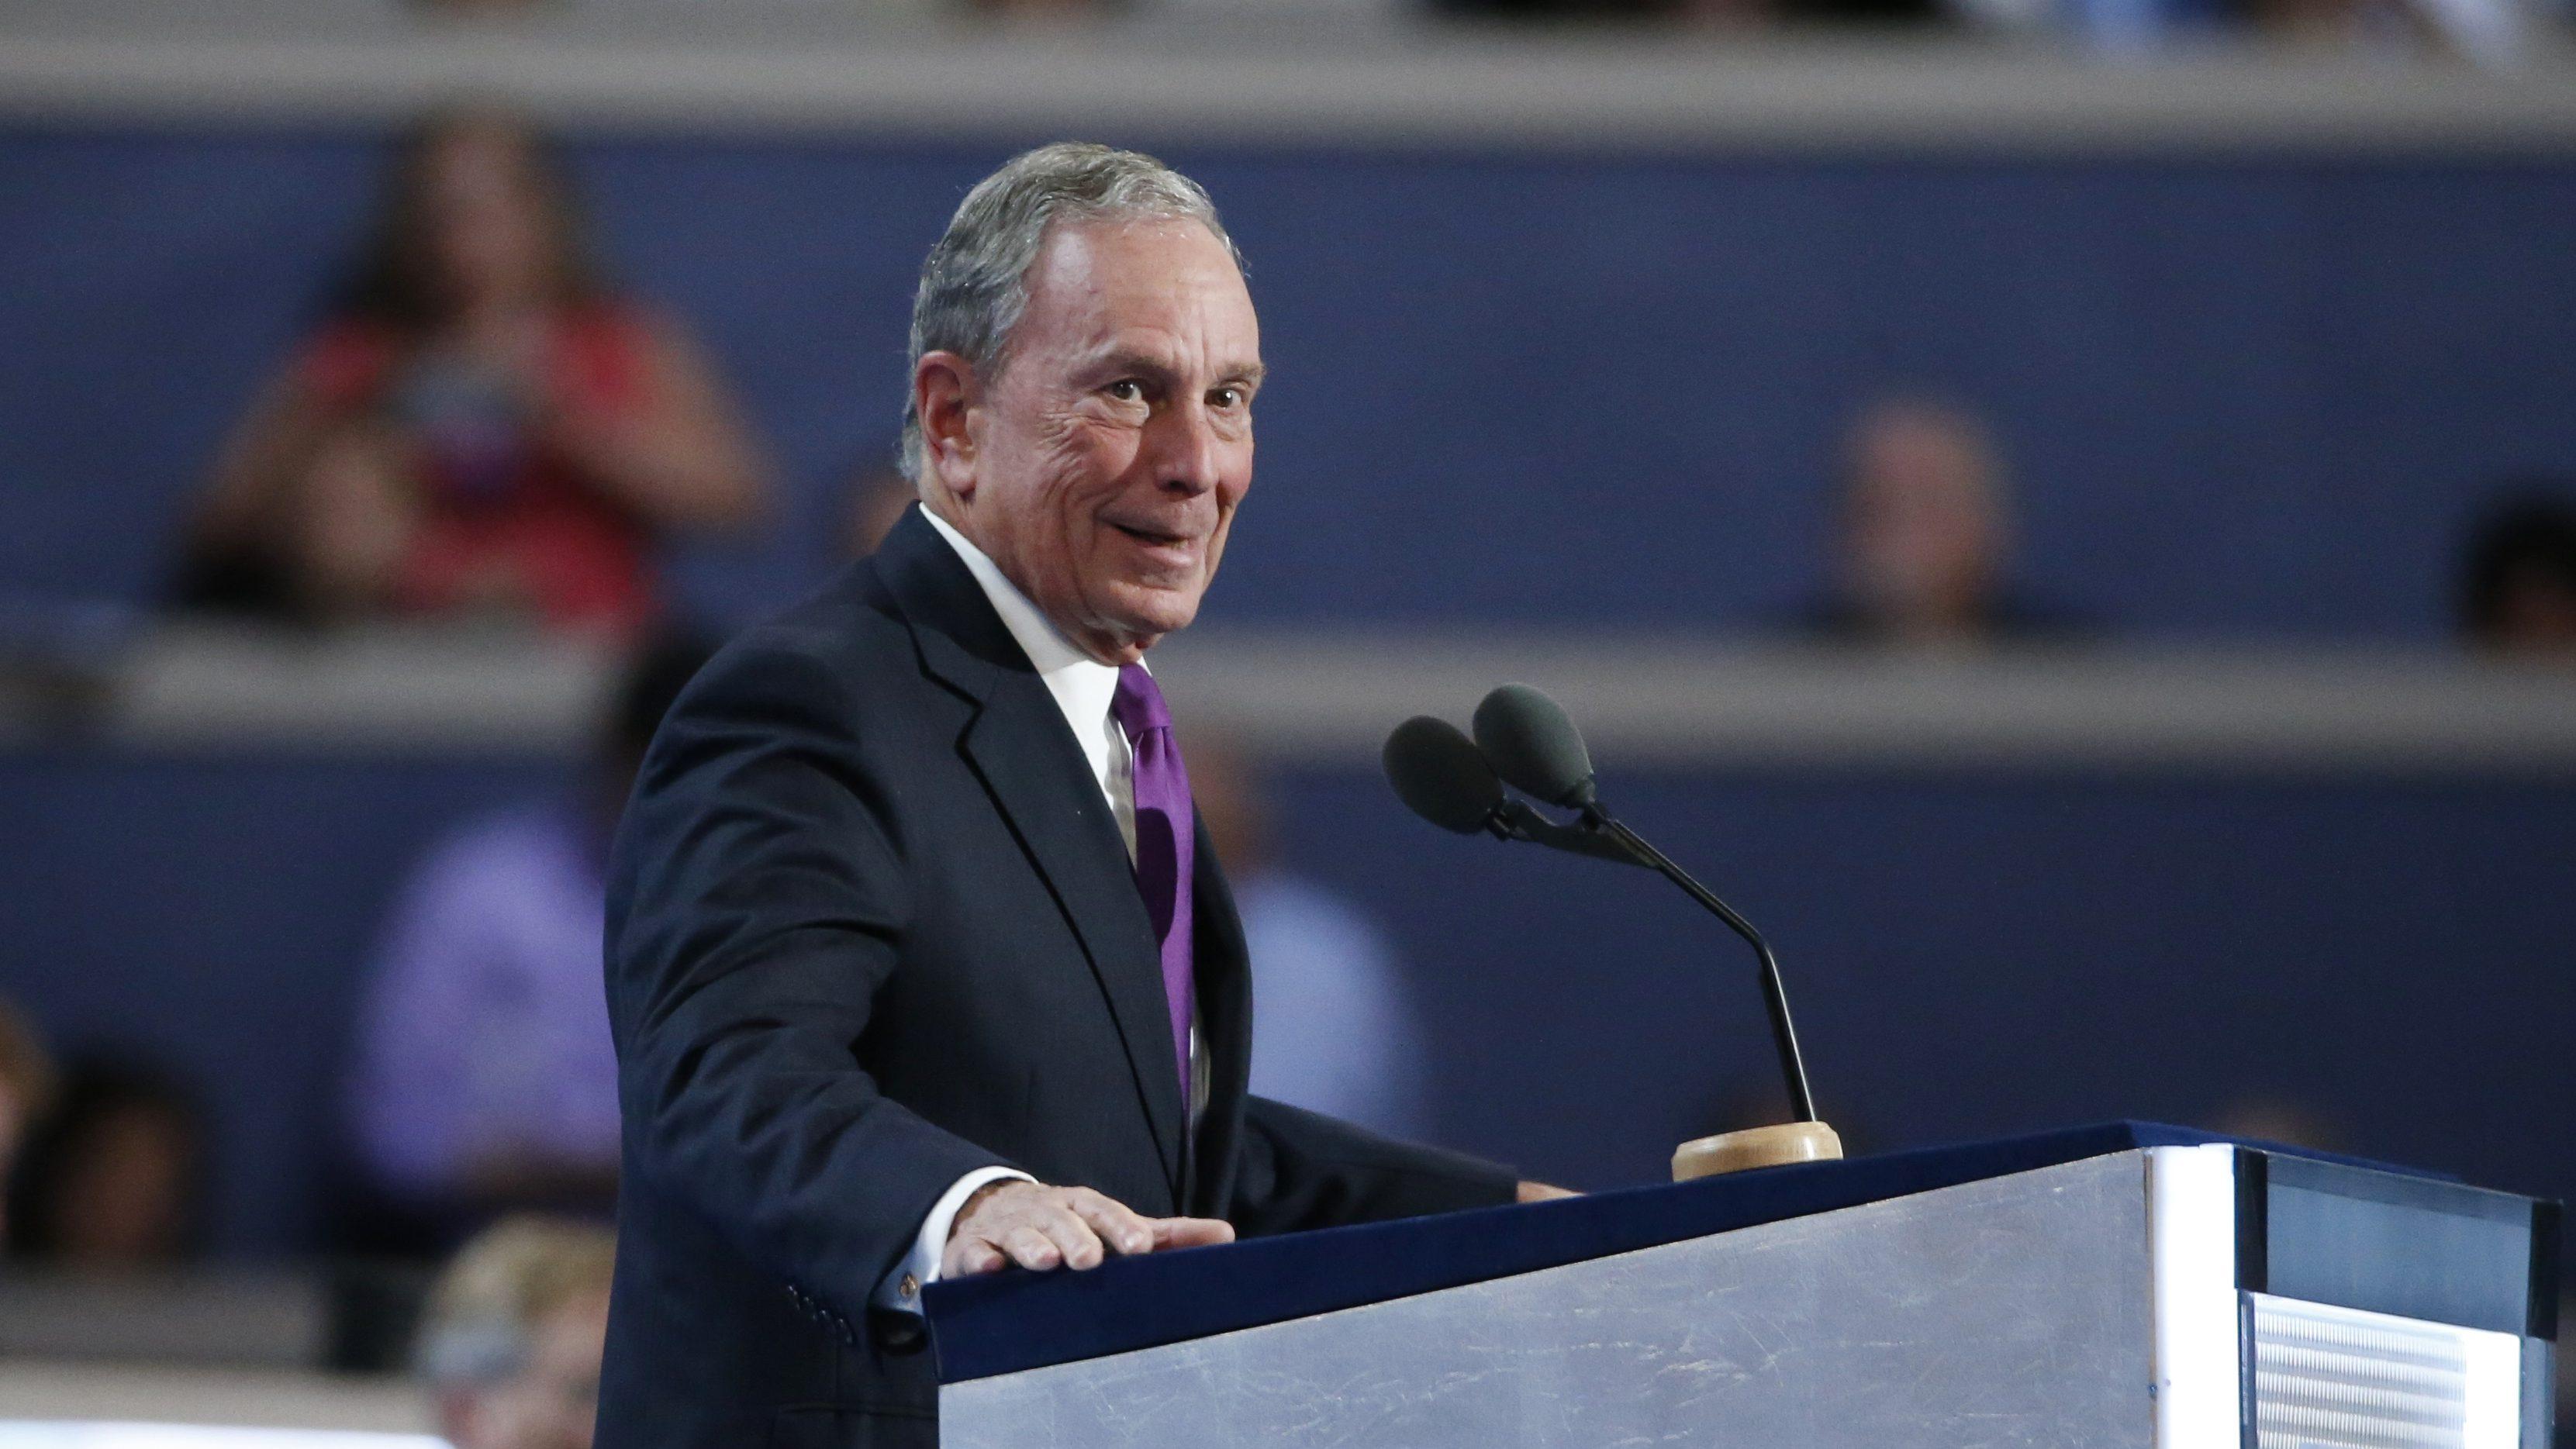 Former New York Mayor Michael Bloomberg speaks at the Democratic National Convention in Philadelphia, Pennsylvania, U.S. July 27, 2016.